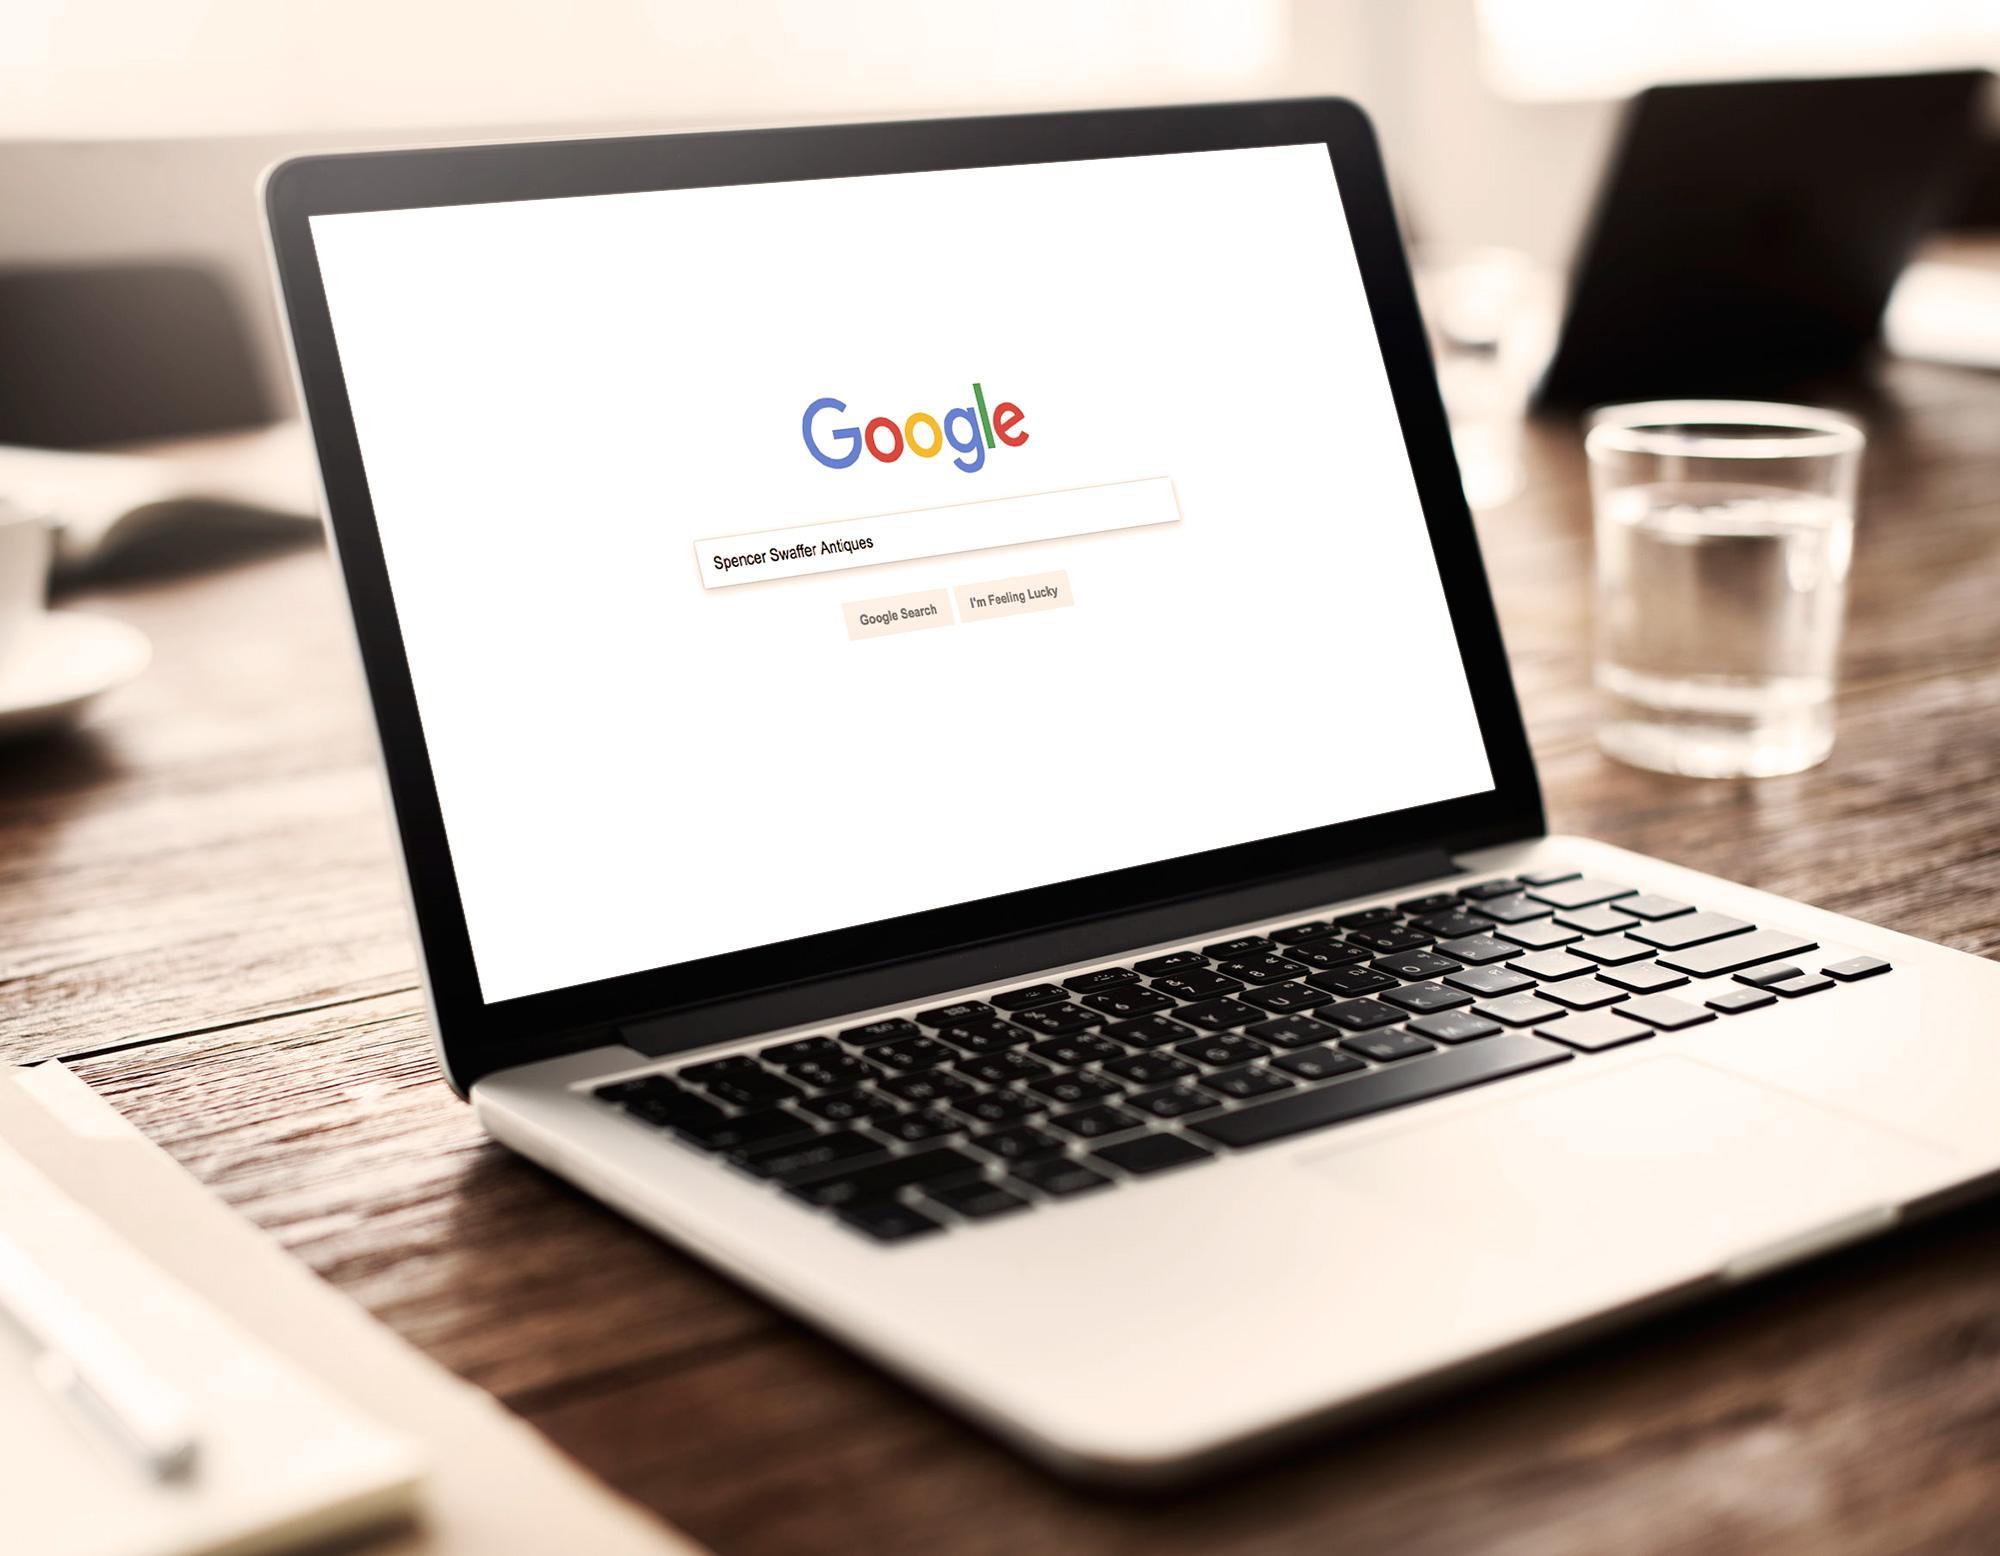 Spencer Swaffer site on Google